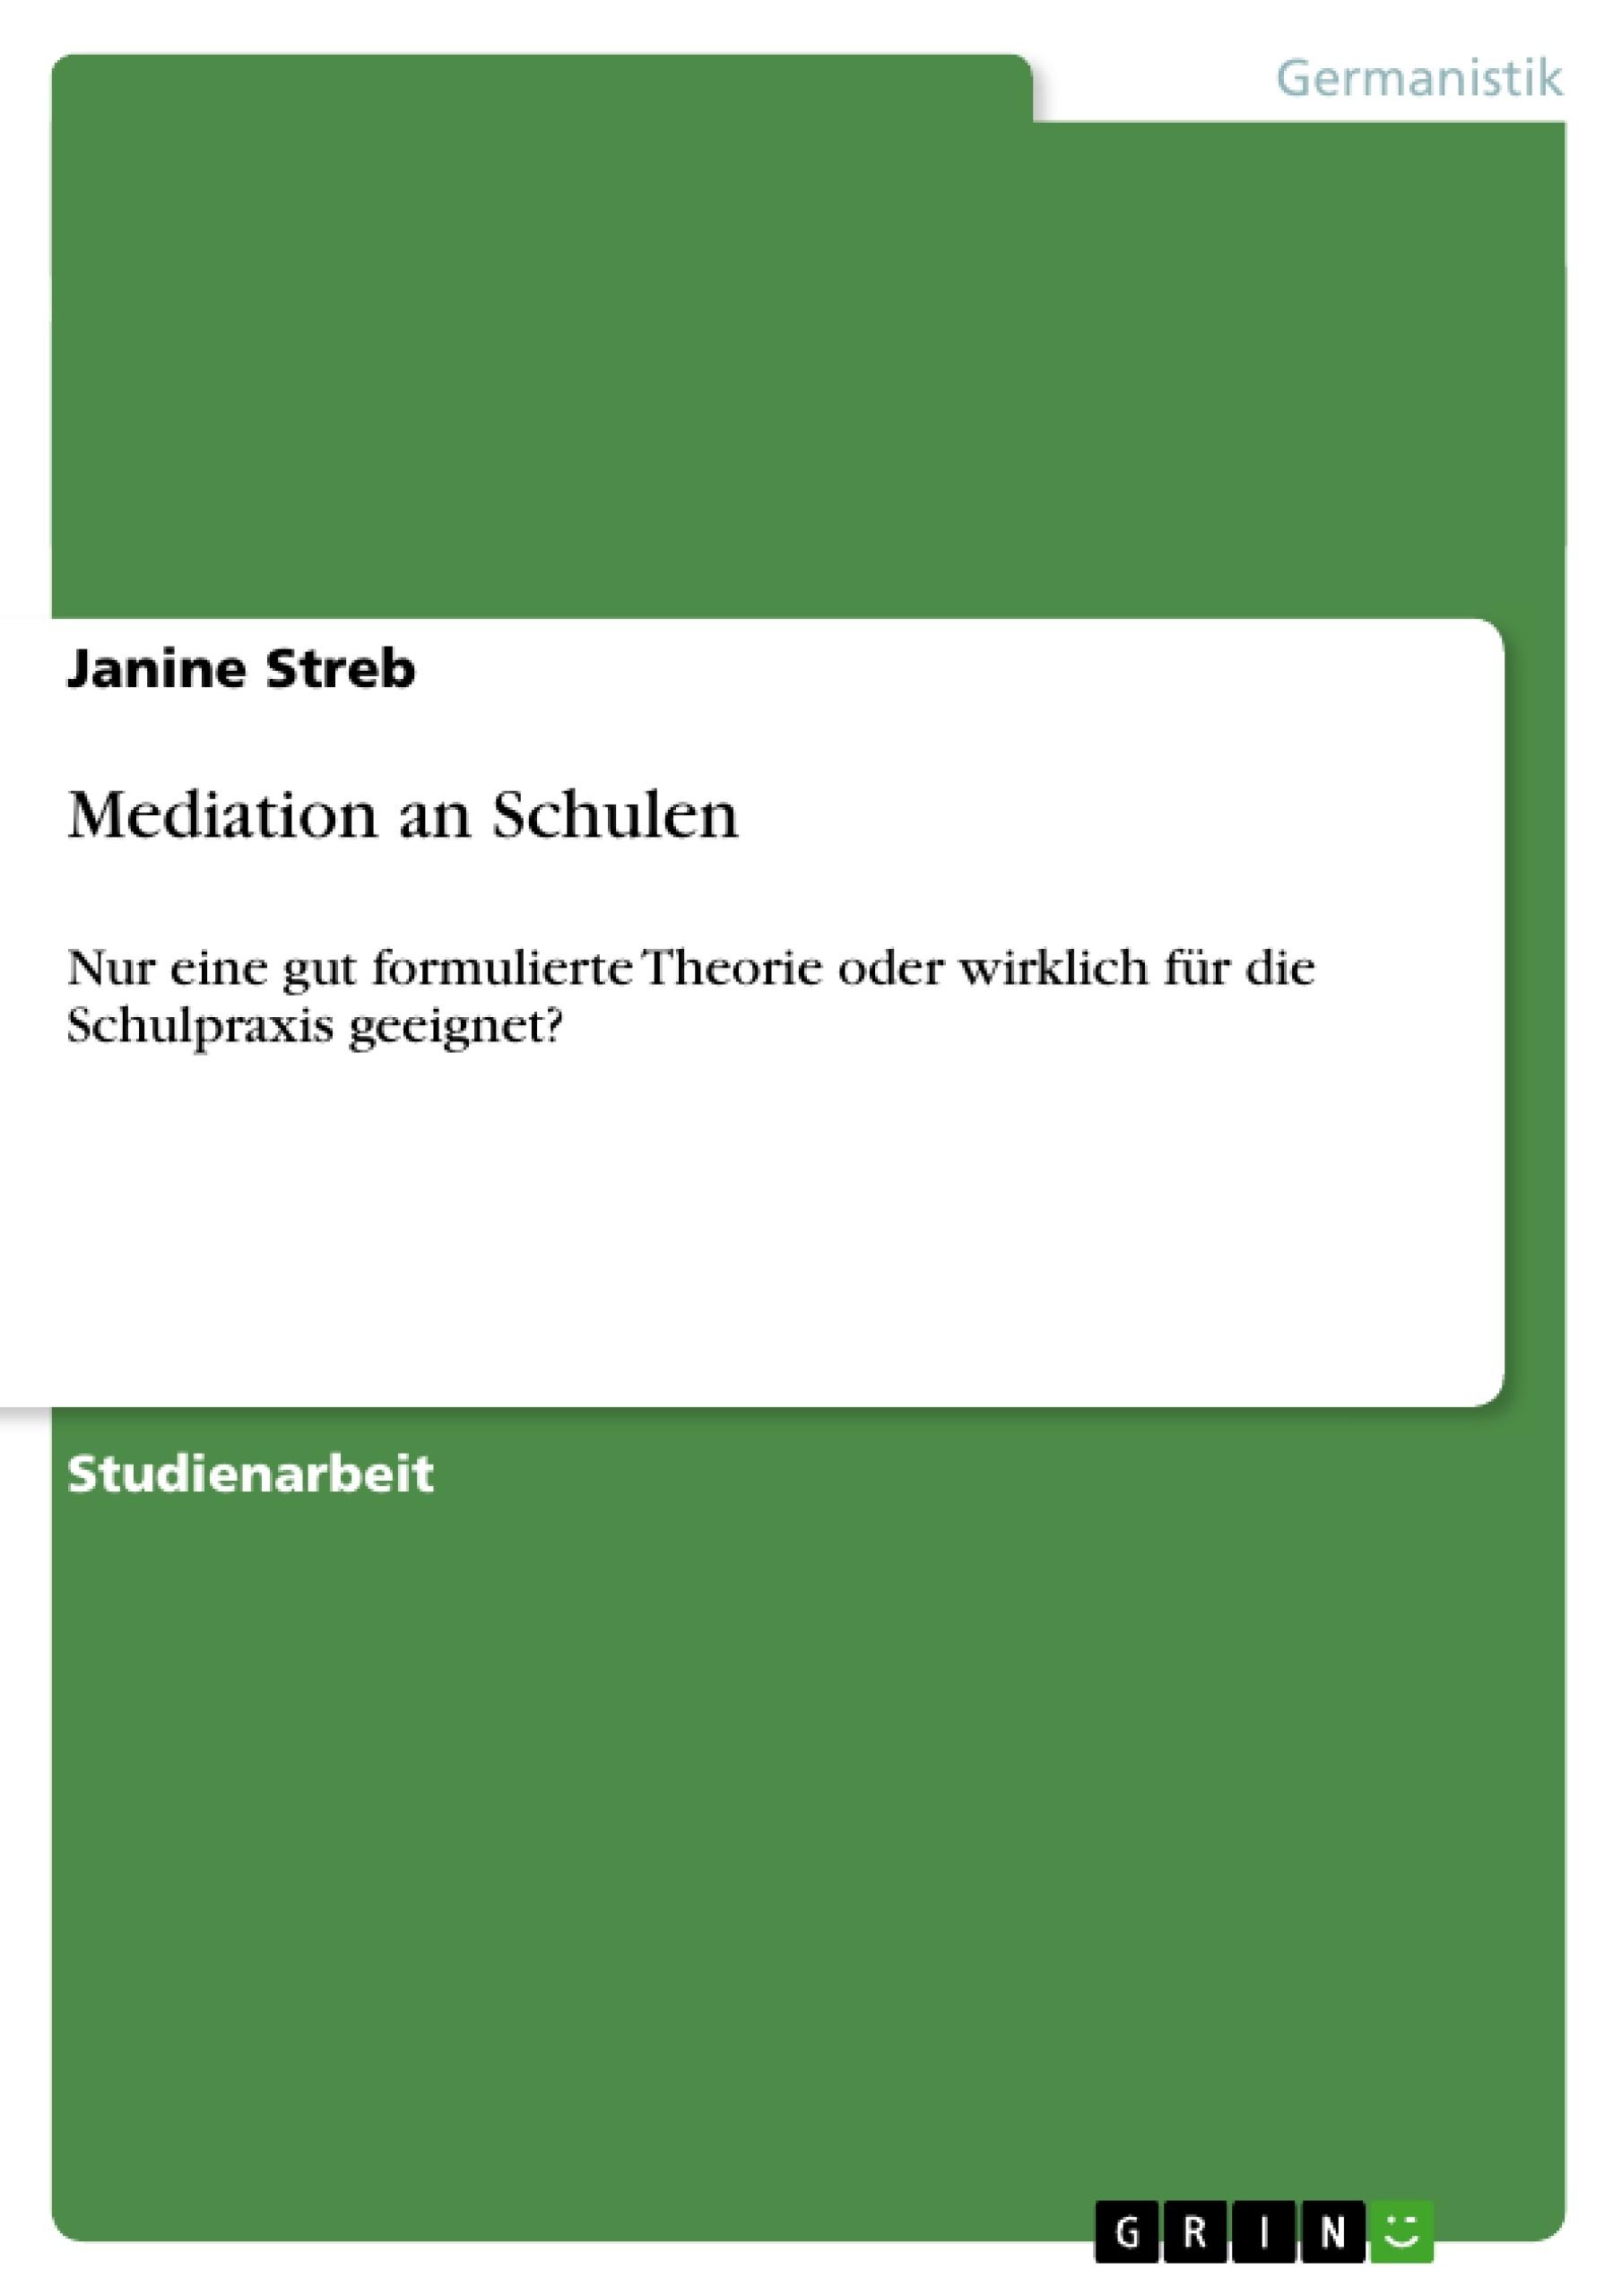 Titel: Mediation an Schulen